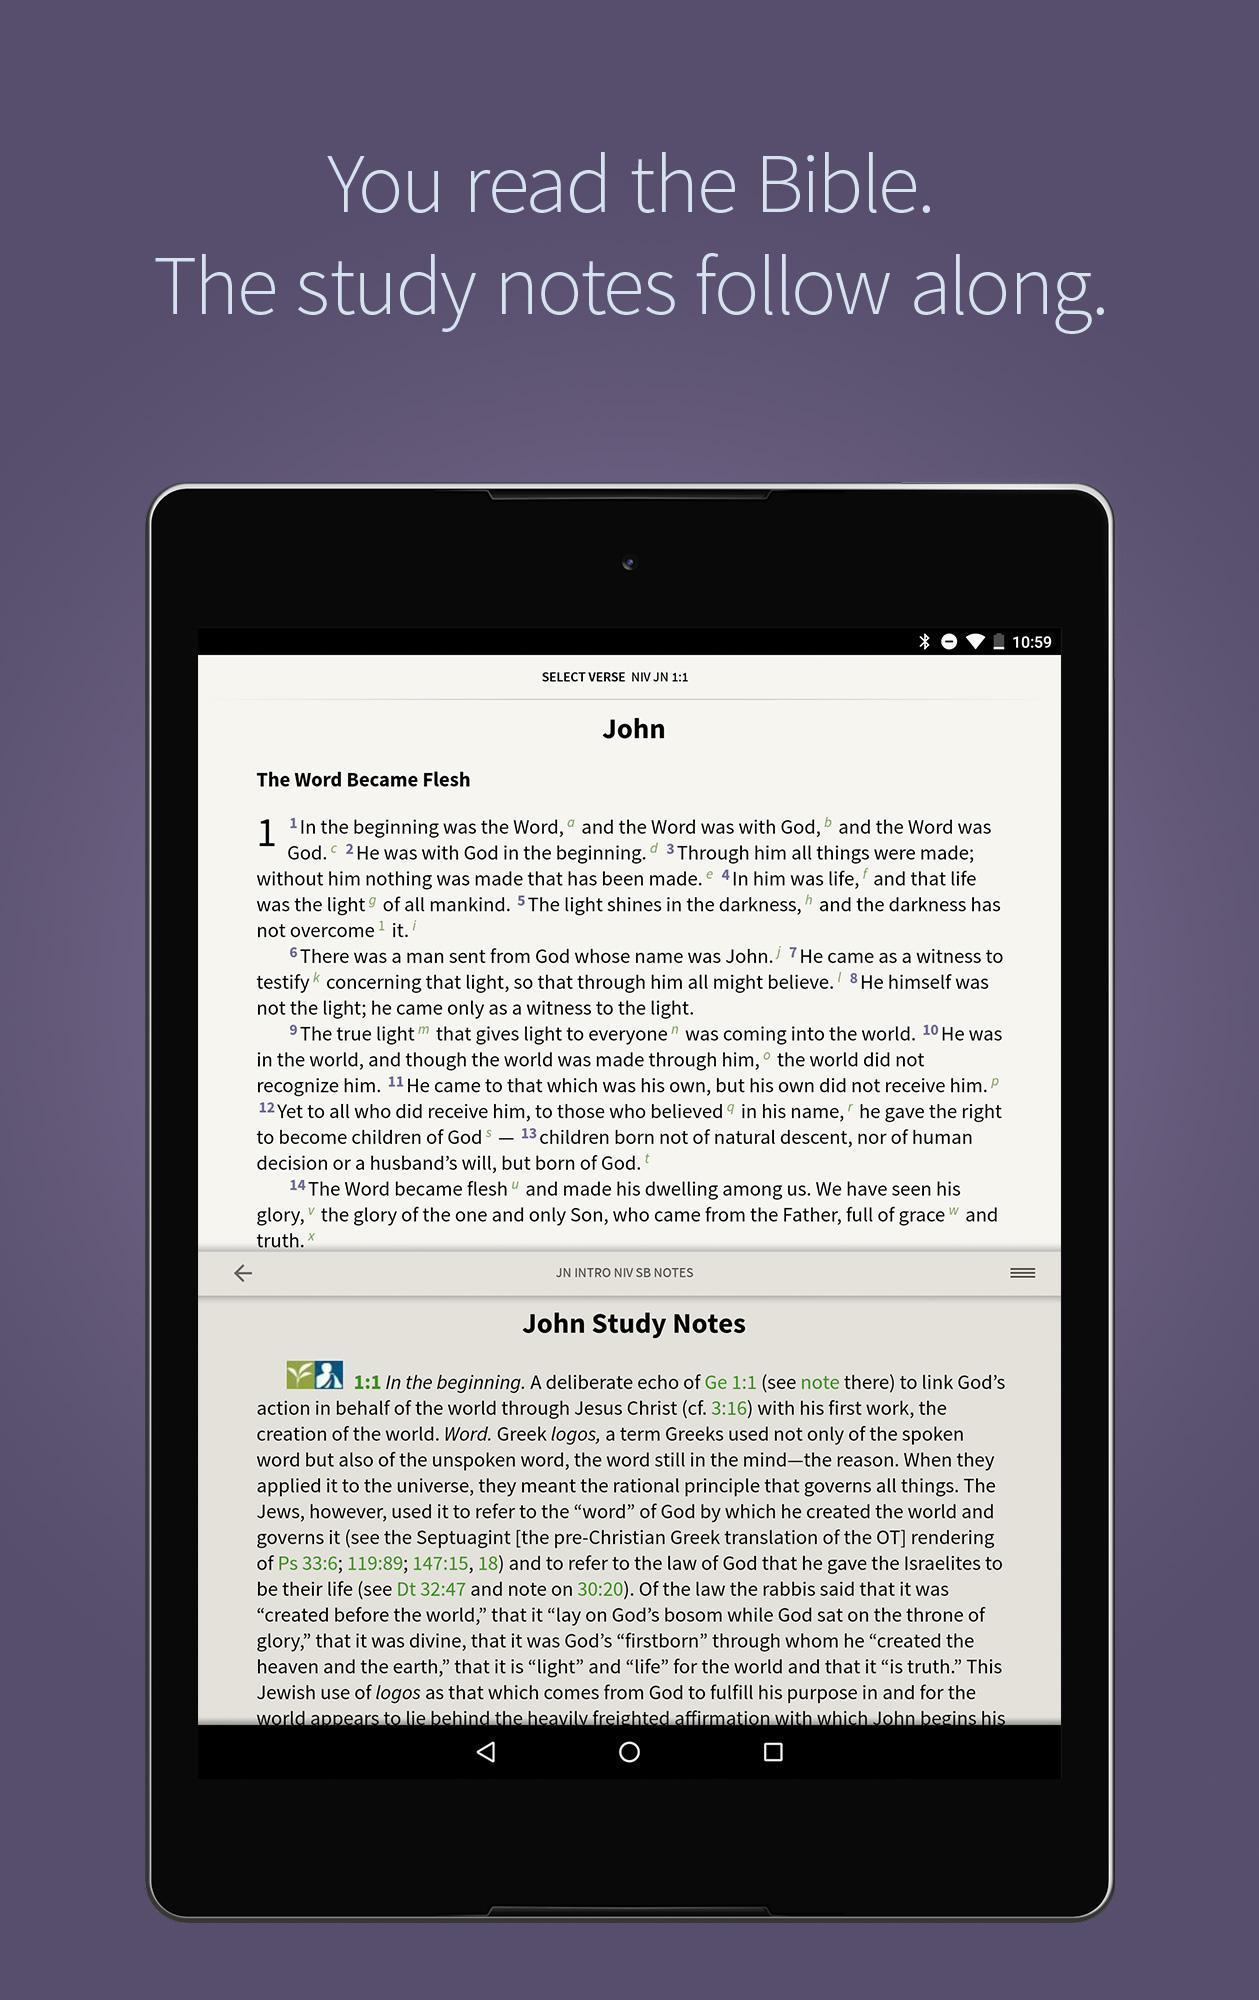 Bible App by Olive Tree 7.5.4.0.5664 Screenshot 15